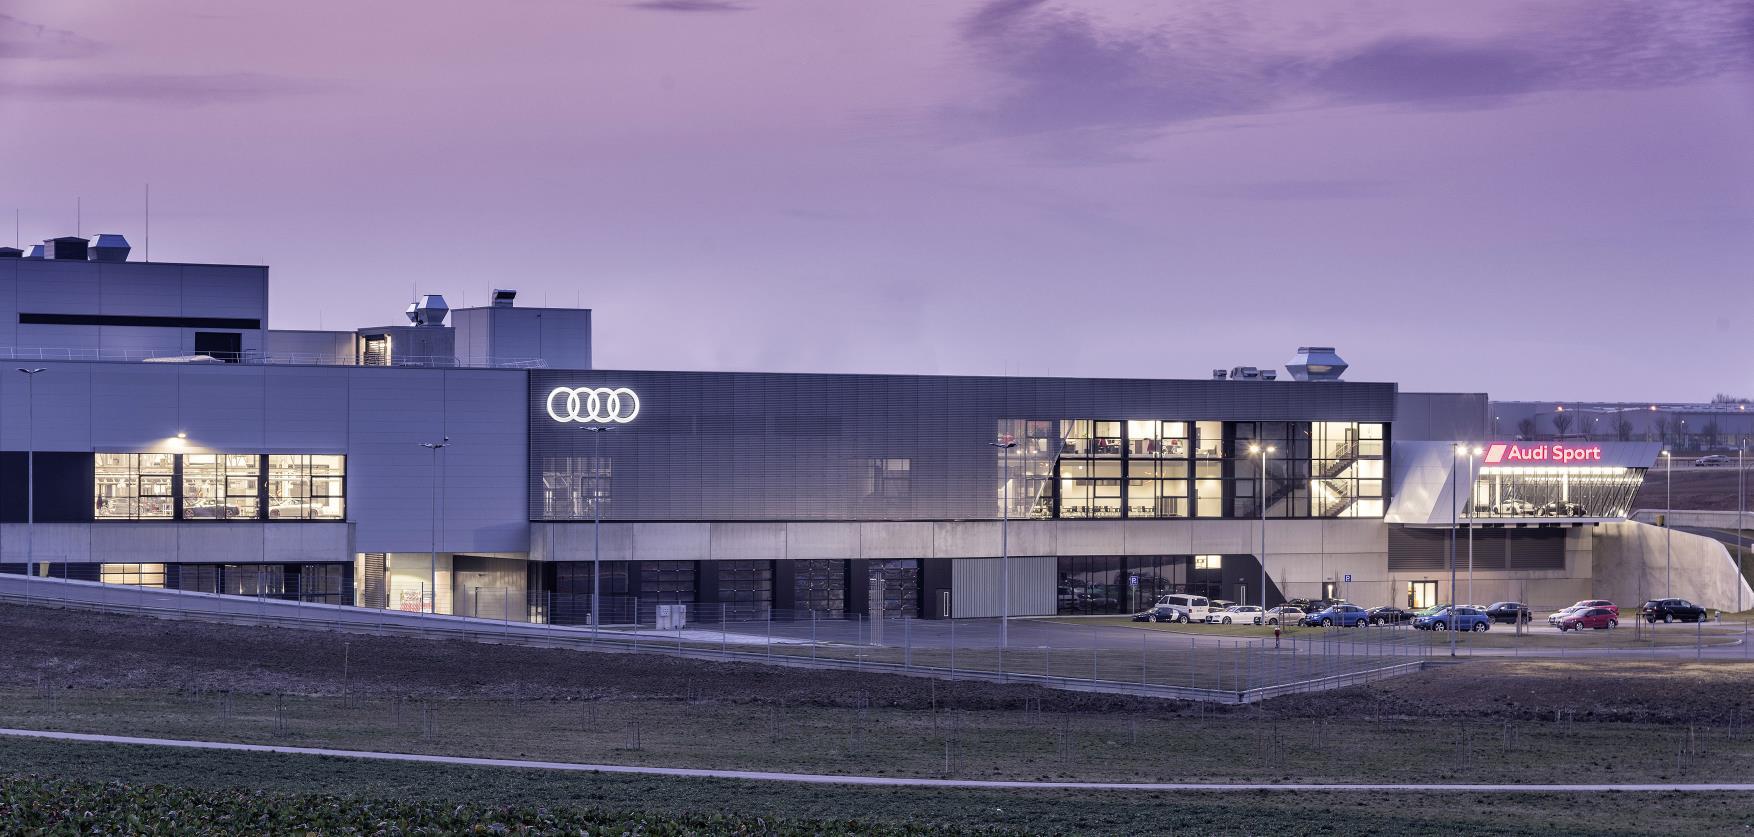 Quattro GMBH Becomes Audi Sport GMBH